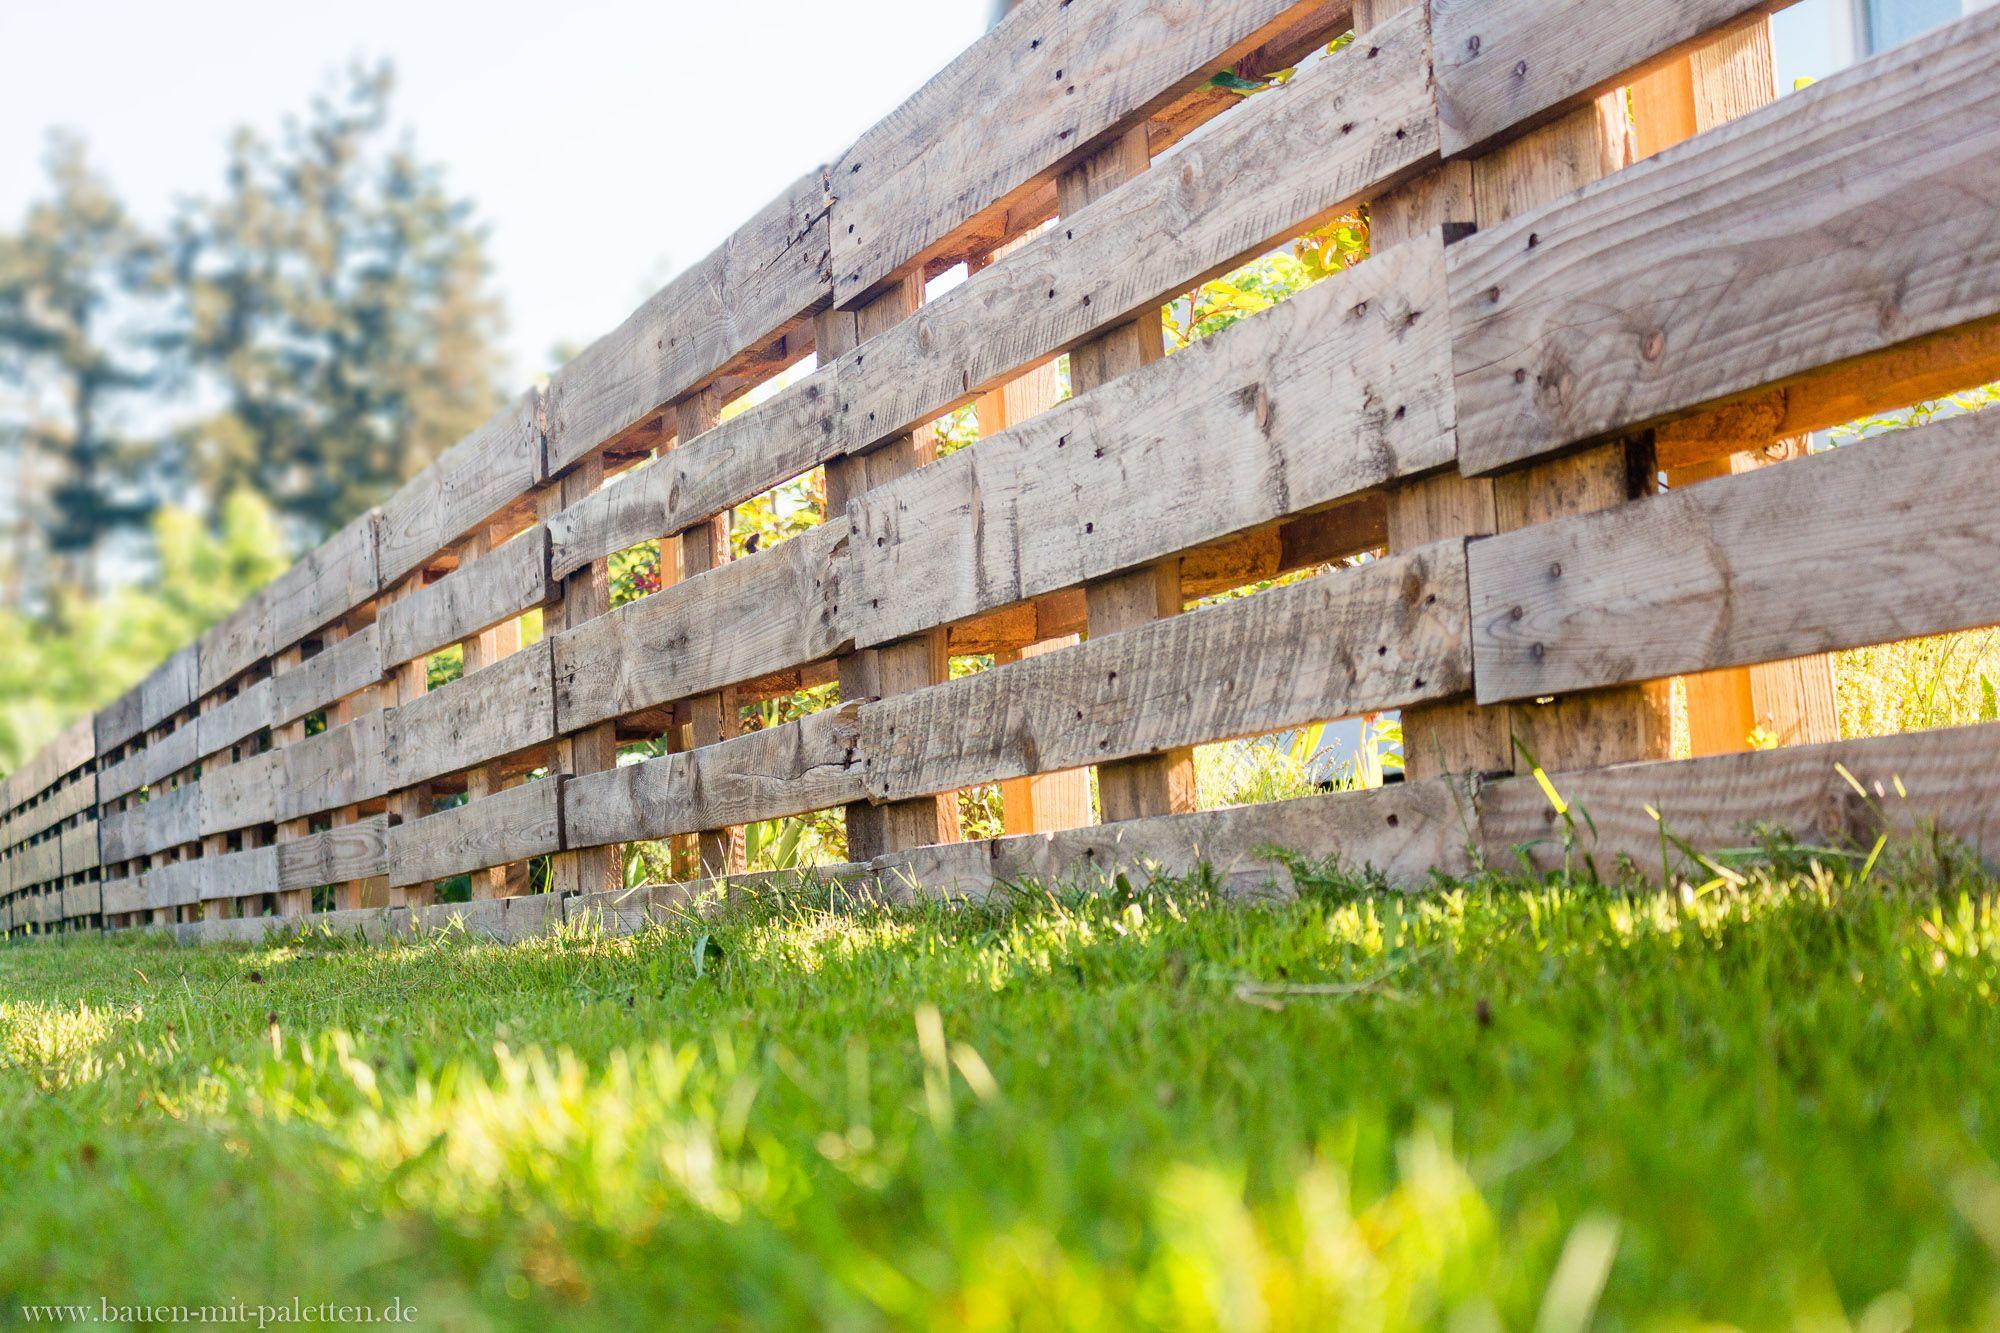 Full Size of Zaun Paletten Palettenzaun Einen Aus Selber Bauen Anleitung Garten Bett Kaufen 140x200 Regal Regale Europaletten Wohnzimmer Zaun Paletten